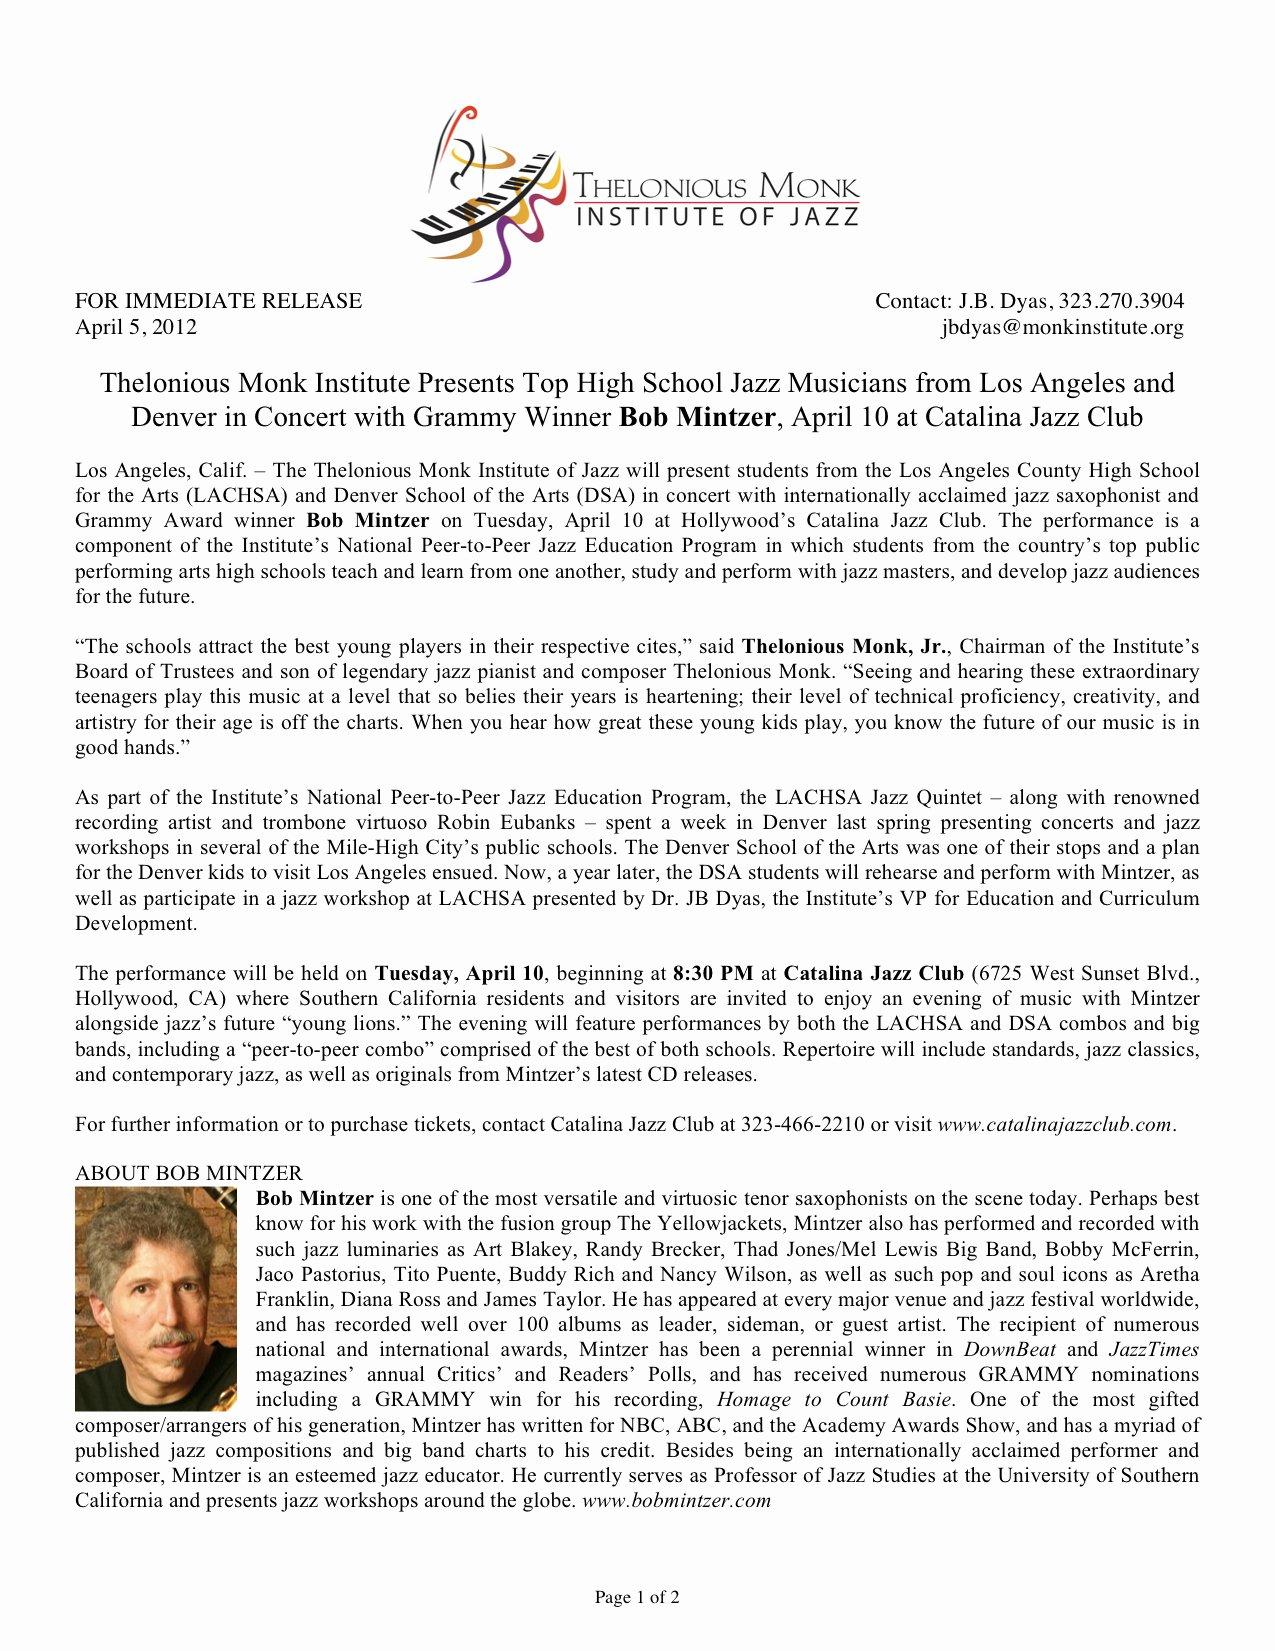 Concert Press Release Template Fresh Press Release Templates Bands Internetexclusive